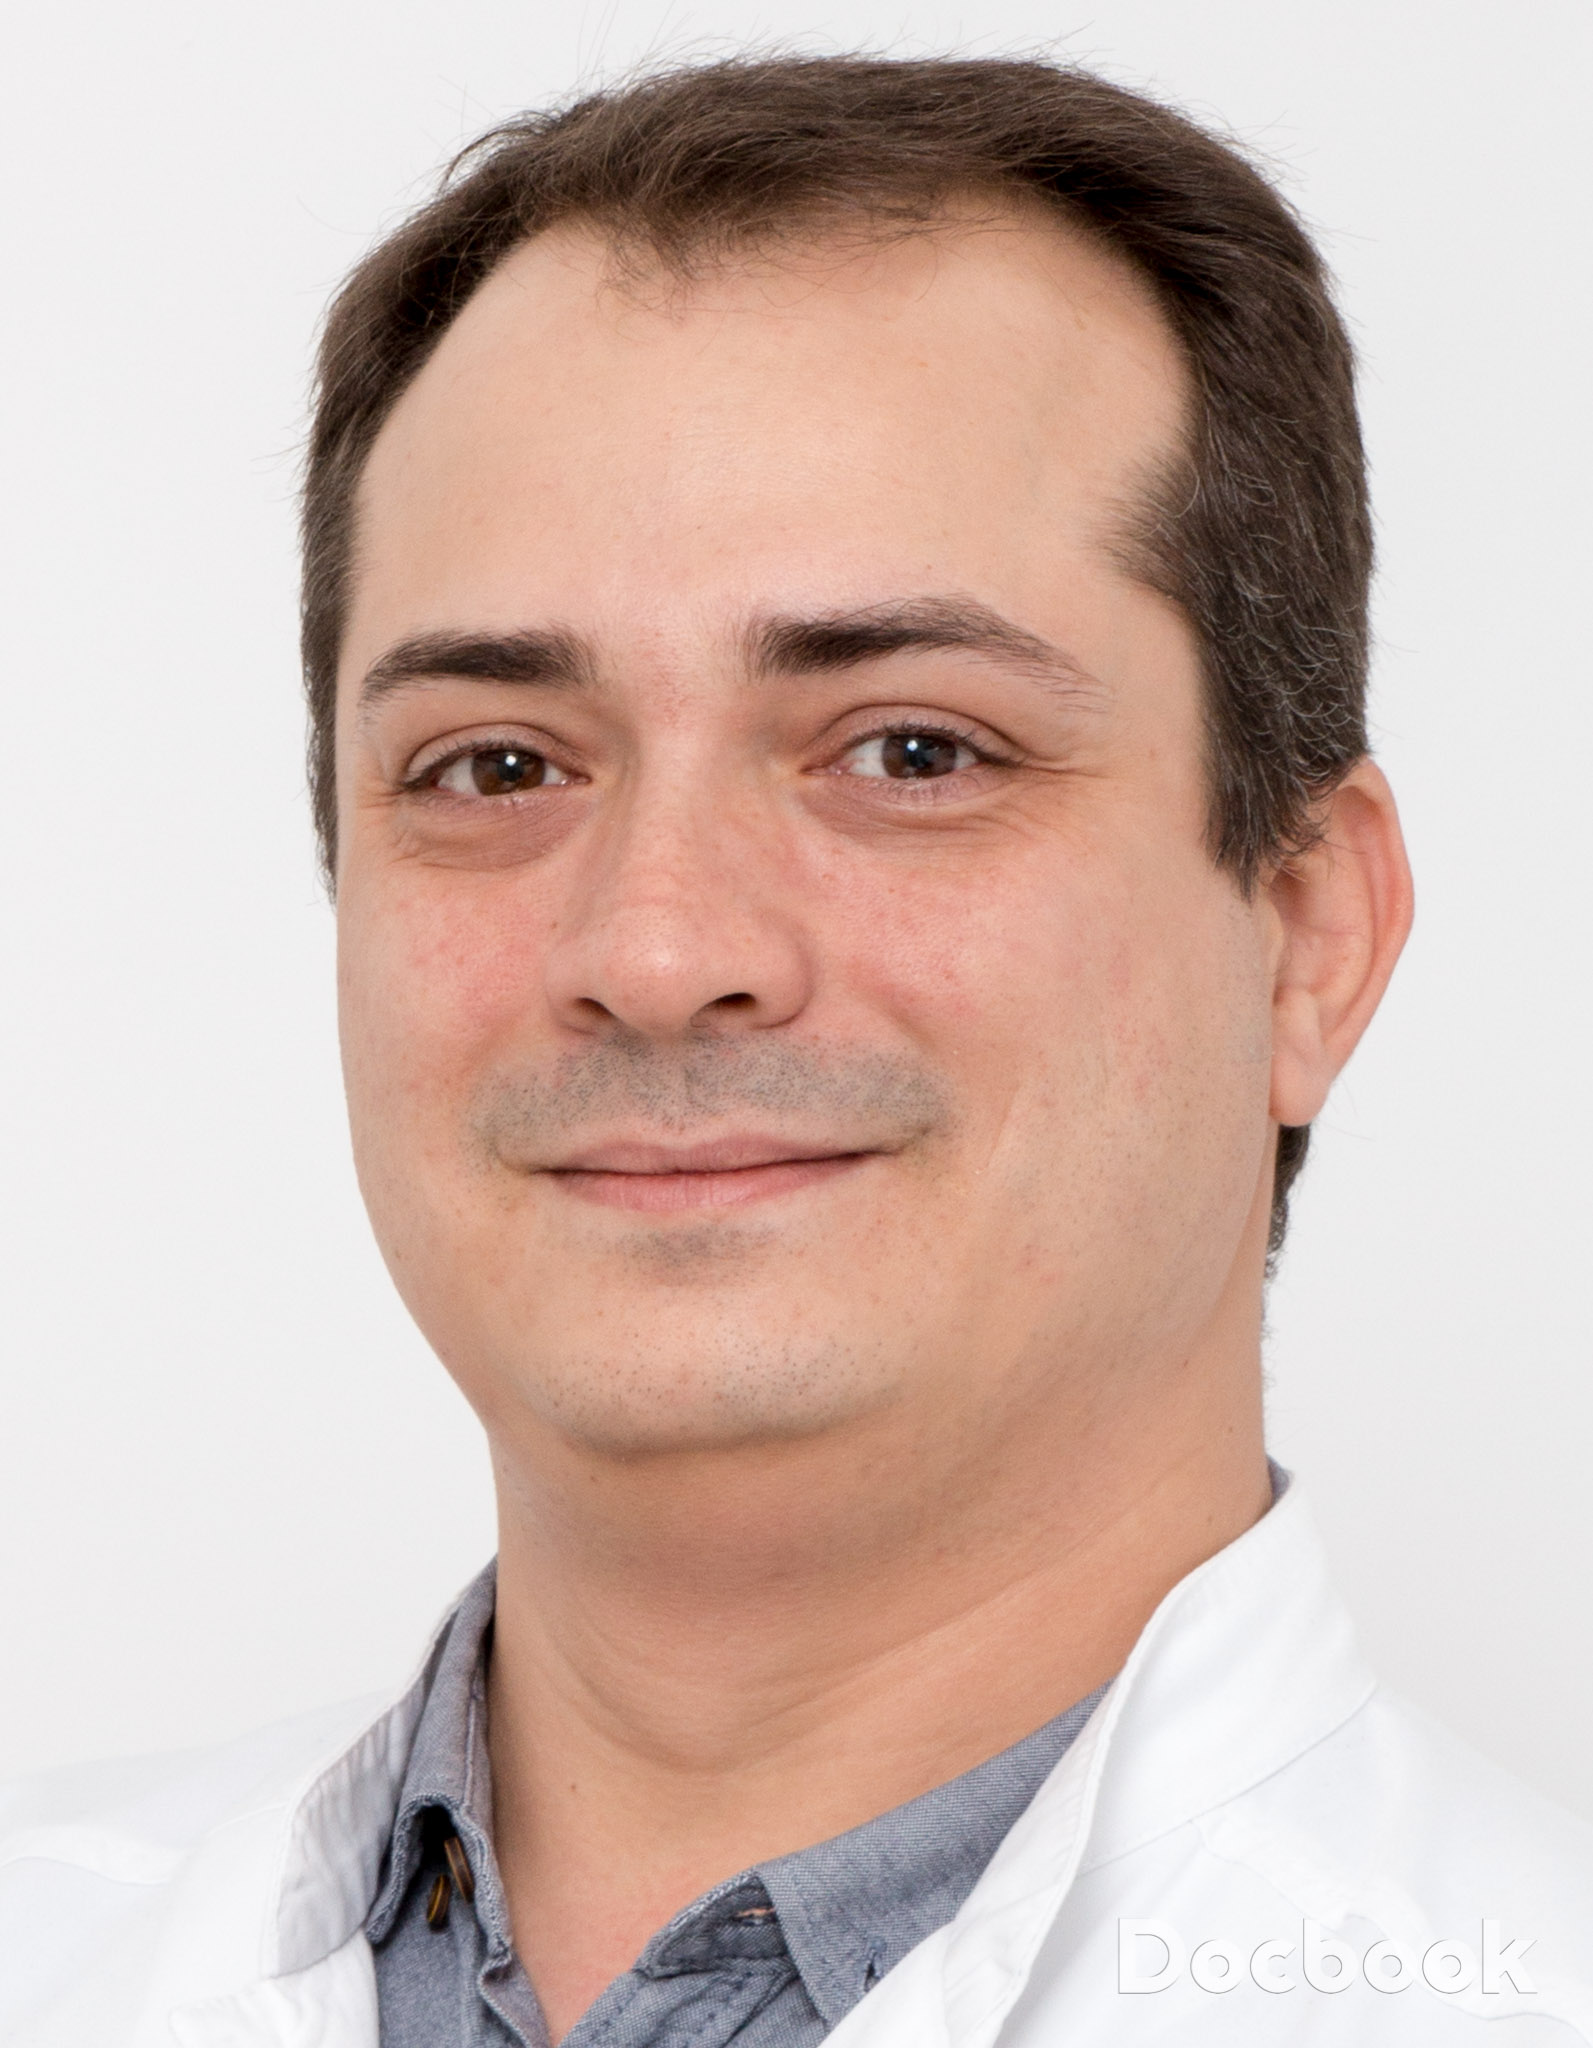 Dr. Mihai Musetescu